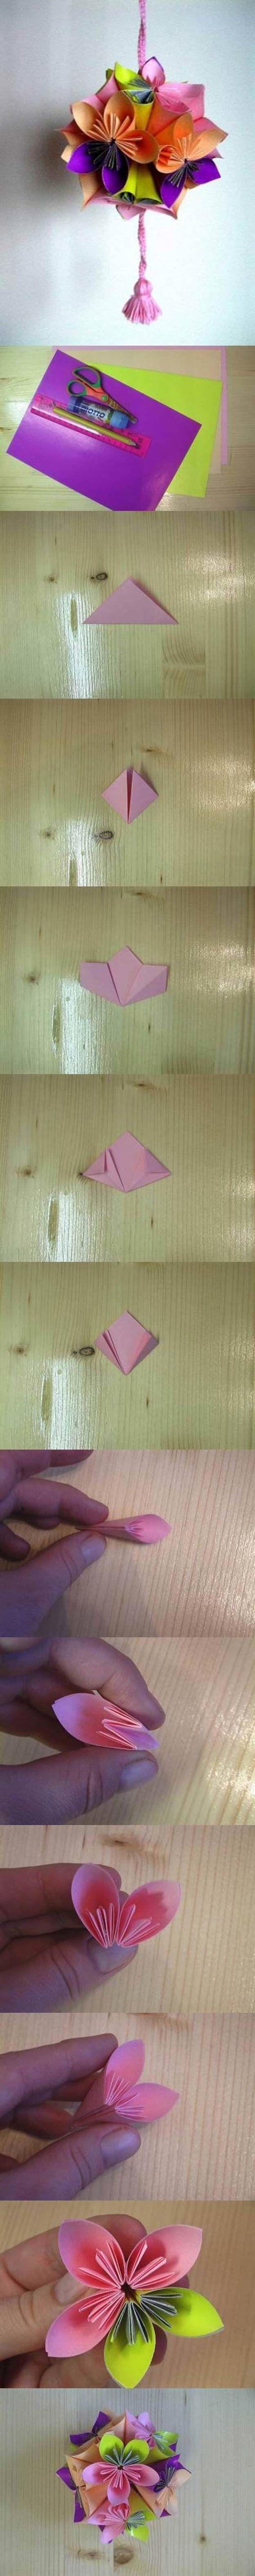 DIY Origami Flower Project by bgenia